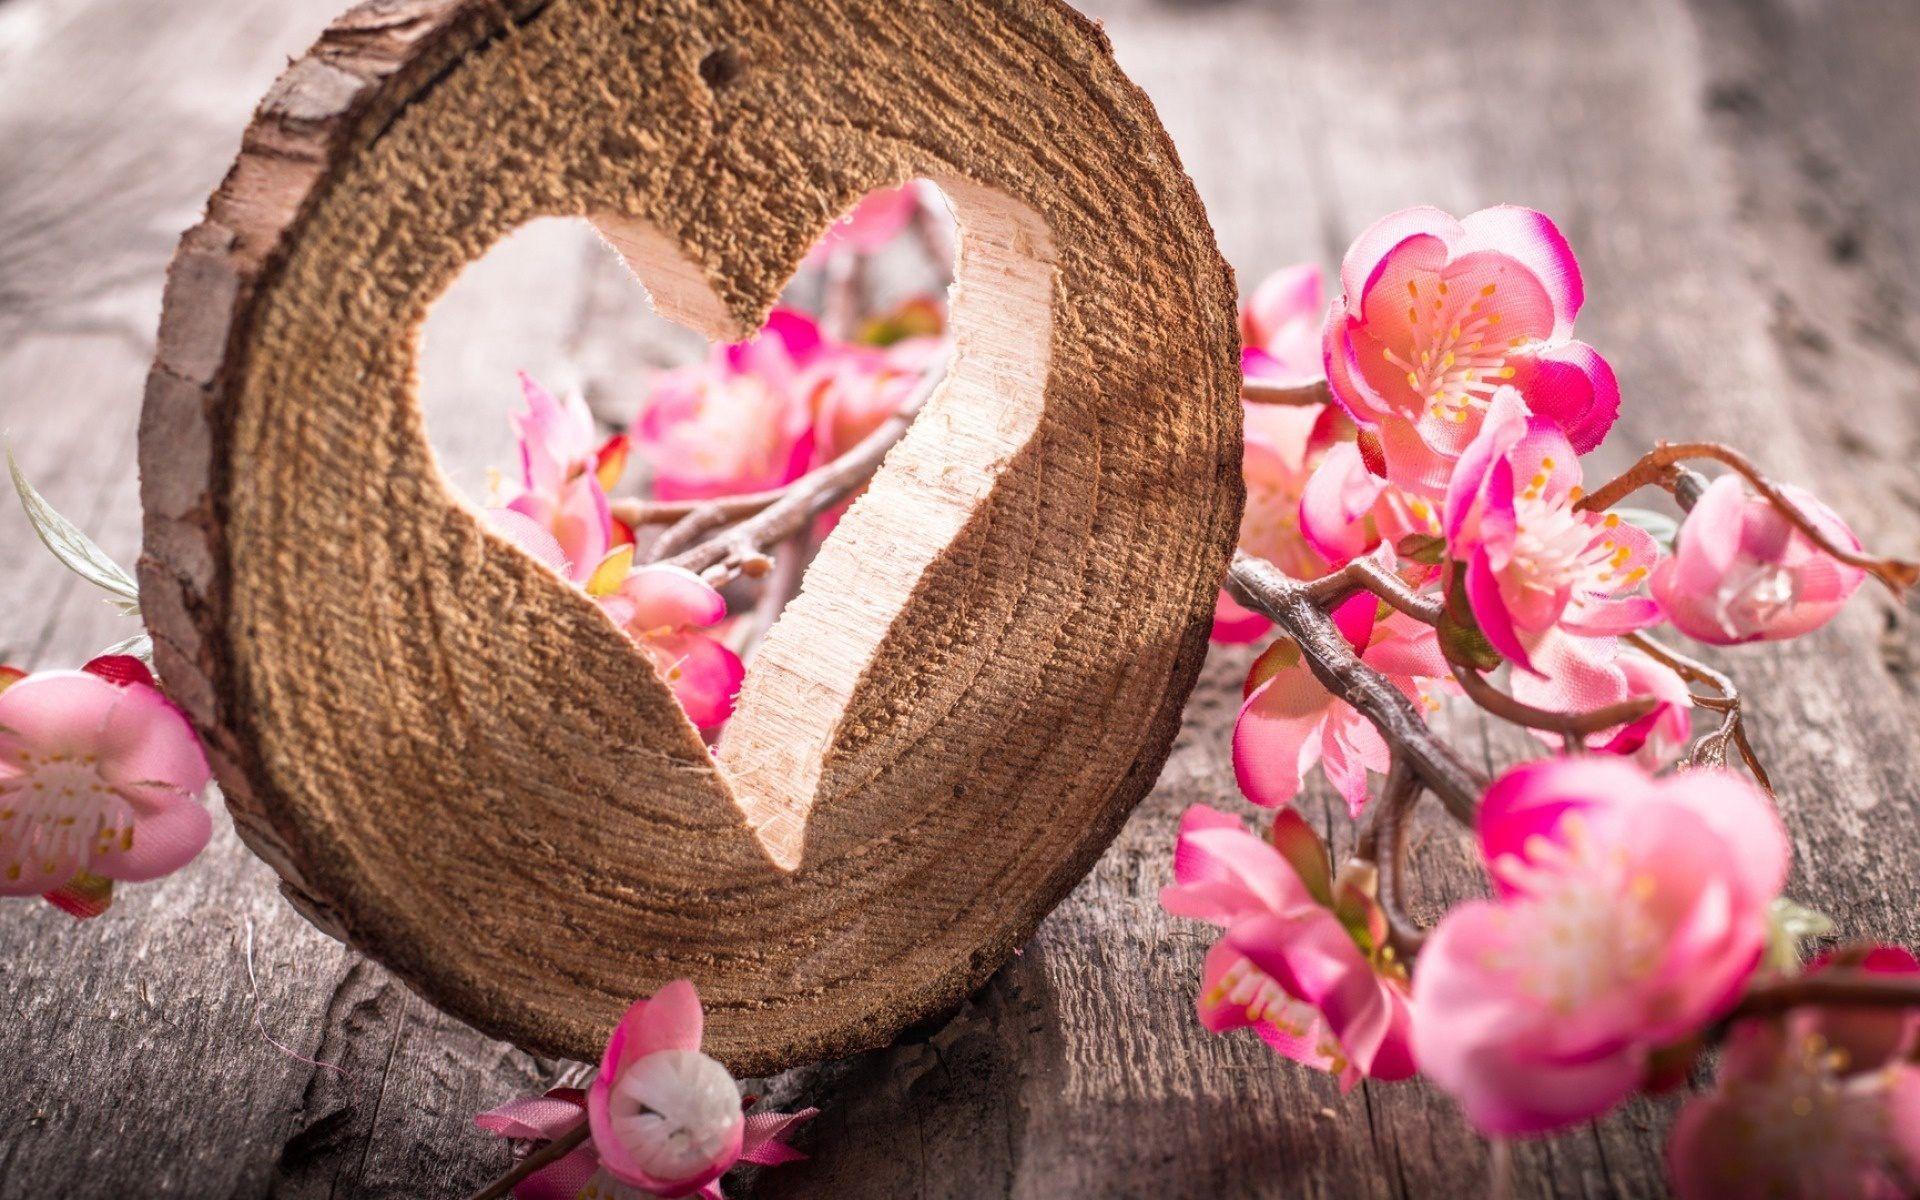 Fine flowers desktop backgrounds pink flowers k ultra hd - Pink roses and hearts wallpaper ...